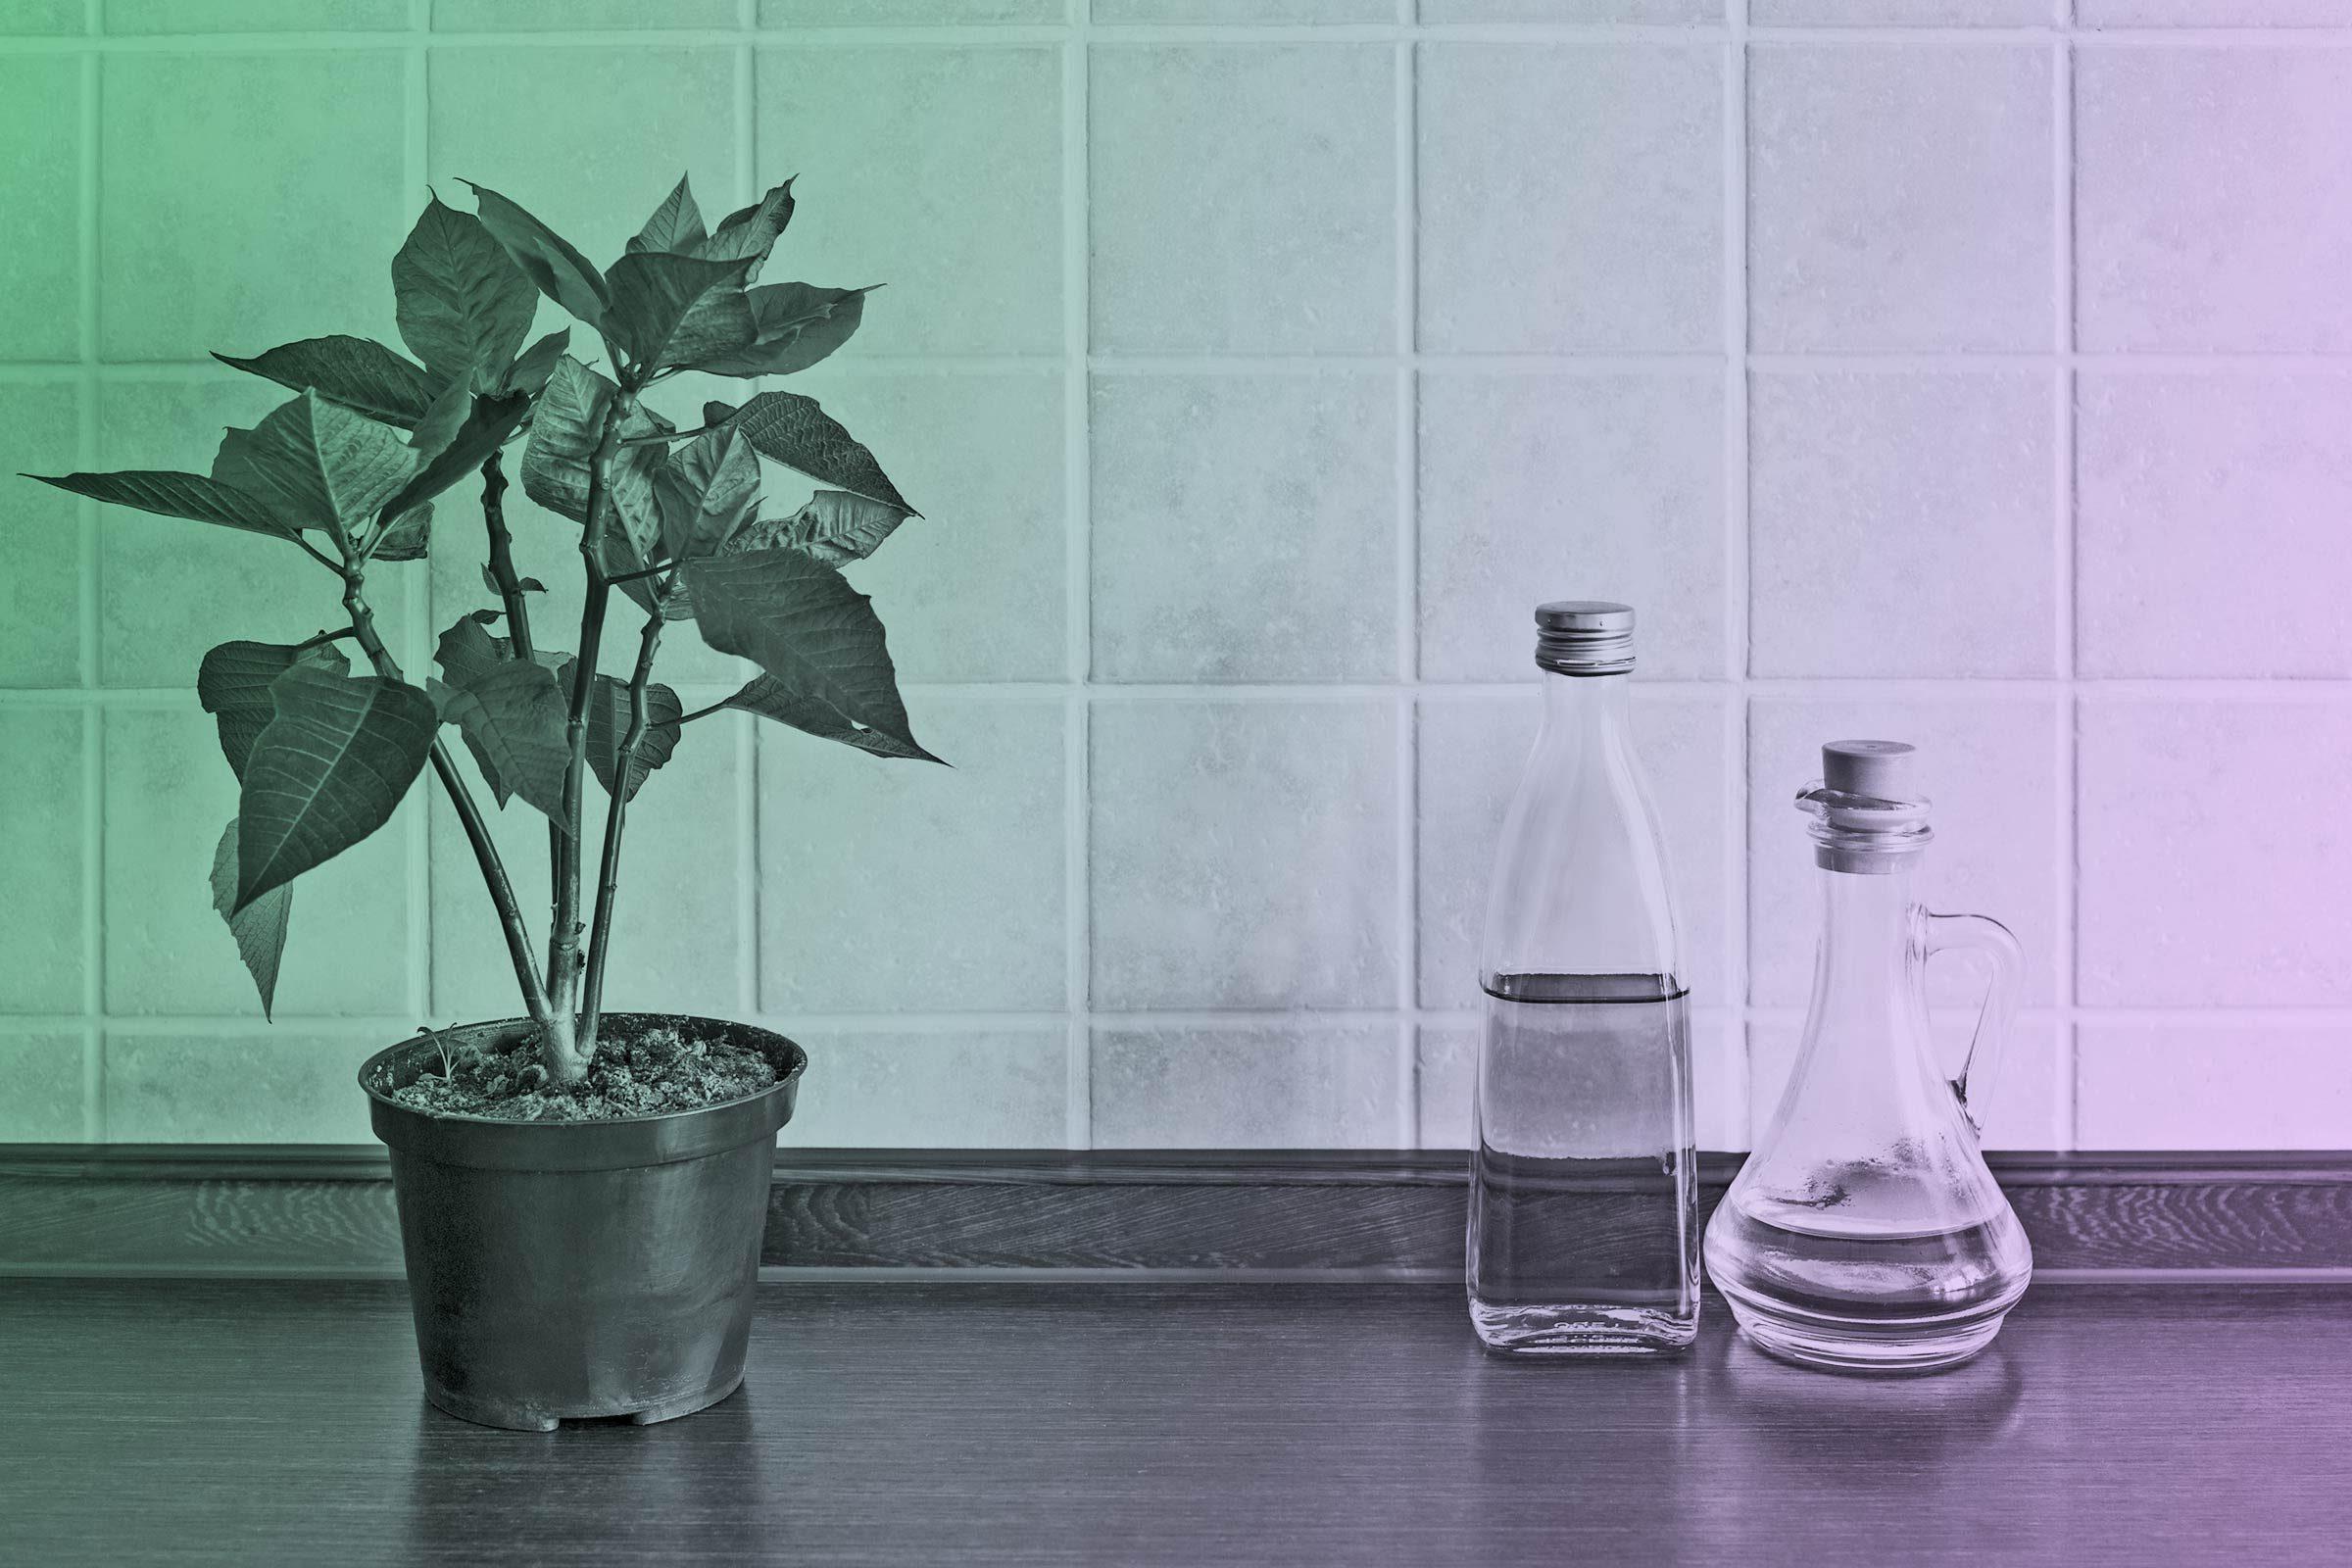 Kitchen Organization: Tips to Make Your Kitchen Less Messy | Reader